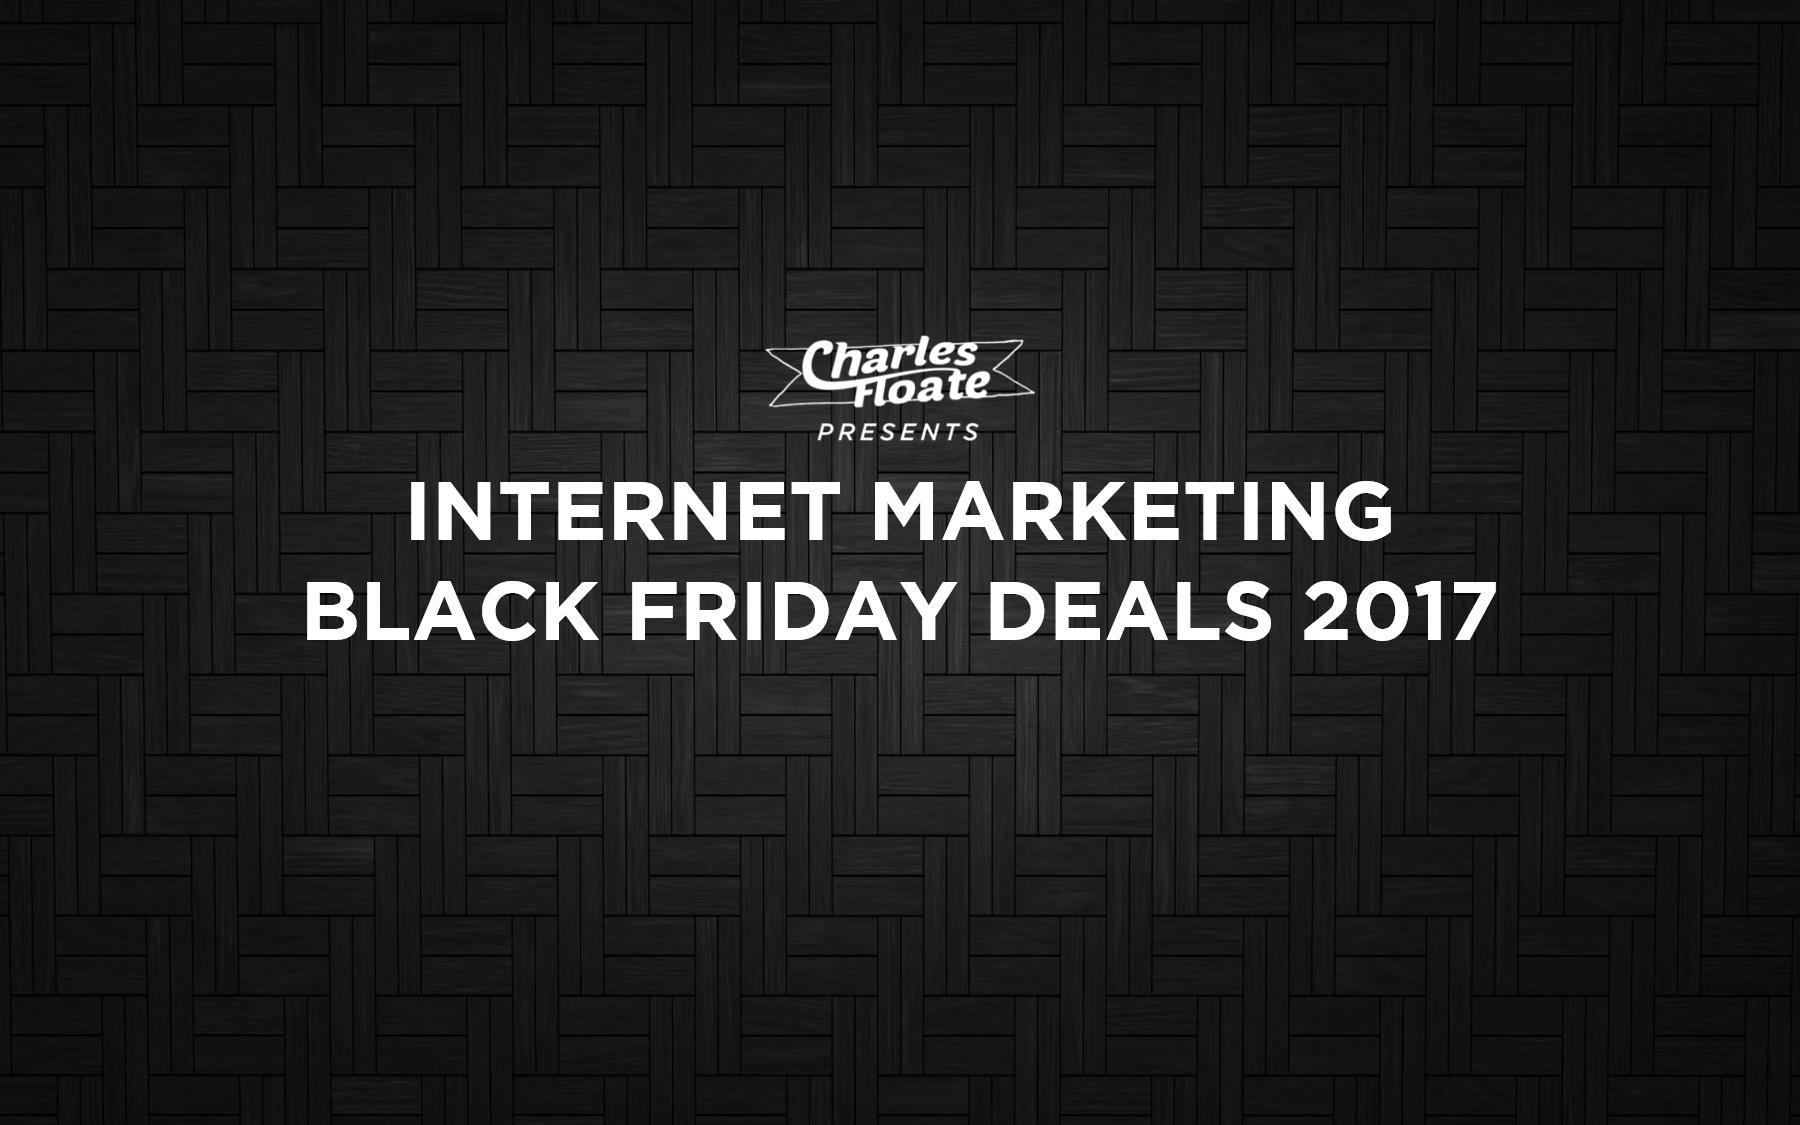 Black Friday Best Internet Marketing Seo Deals For 2017